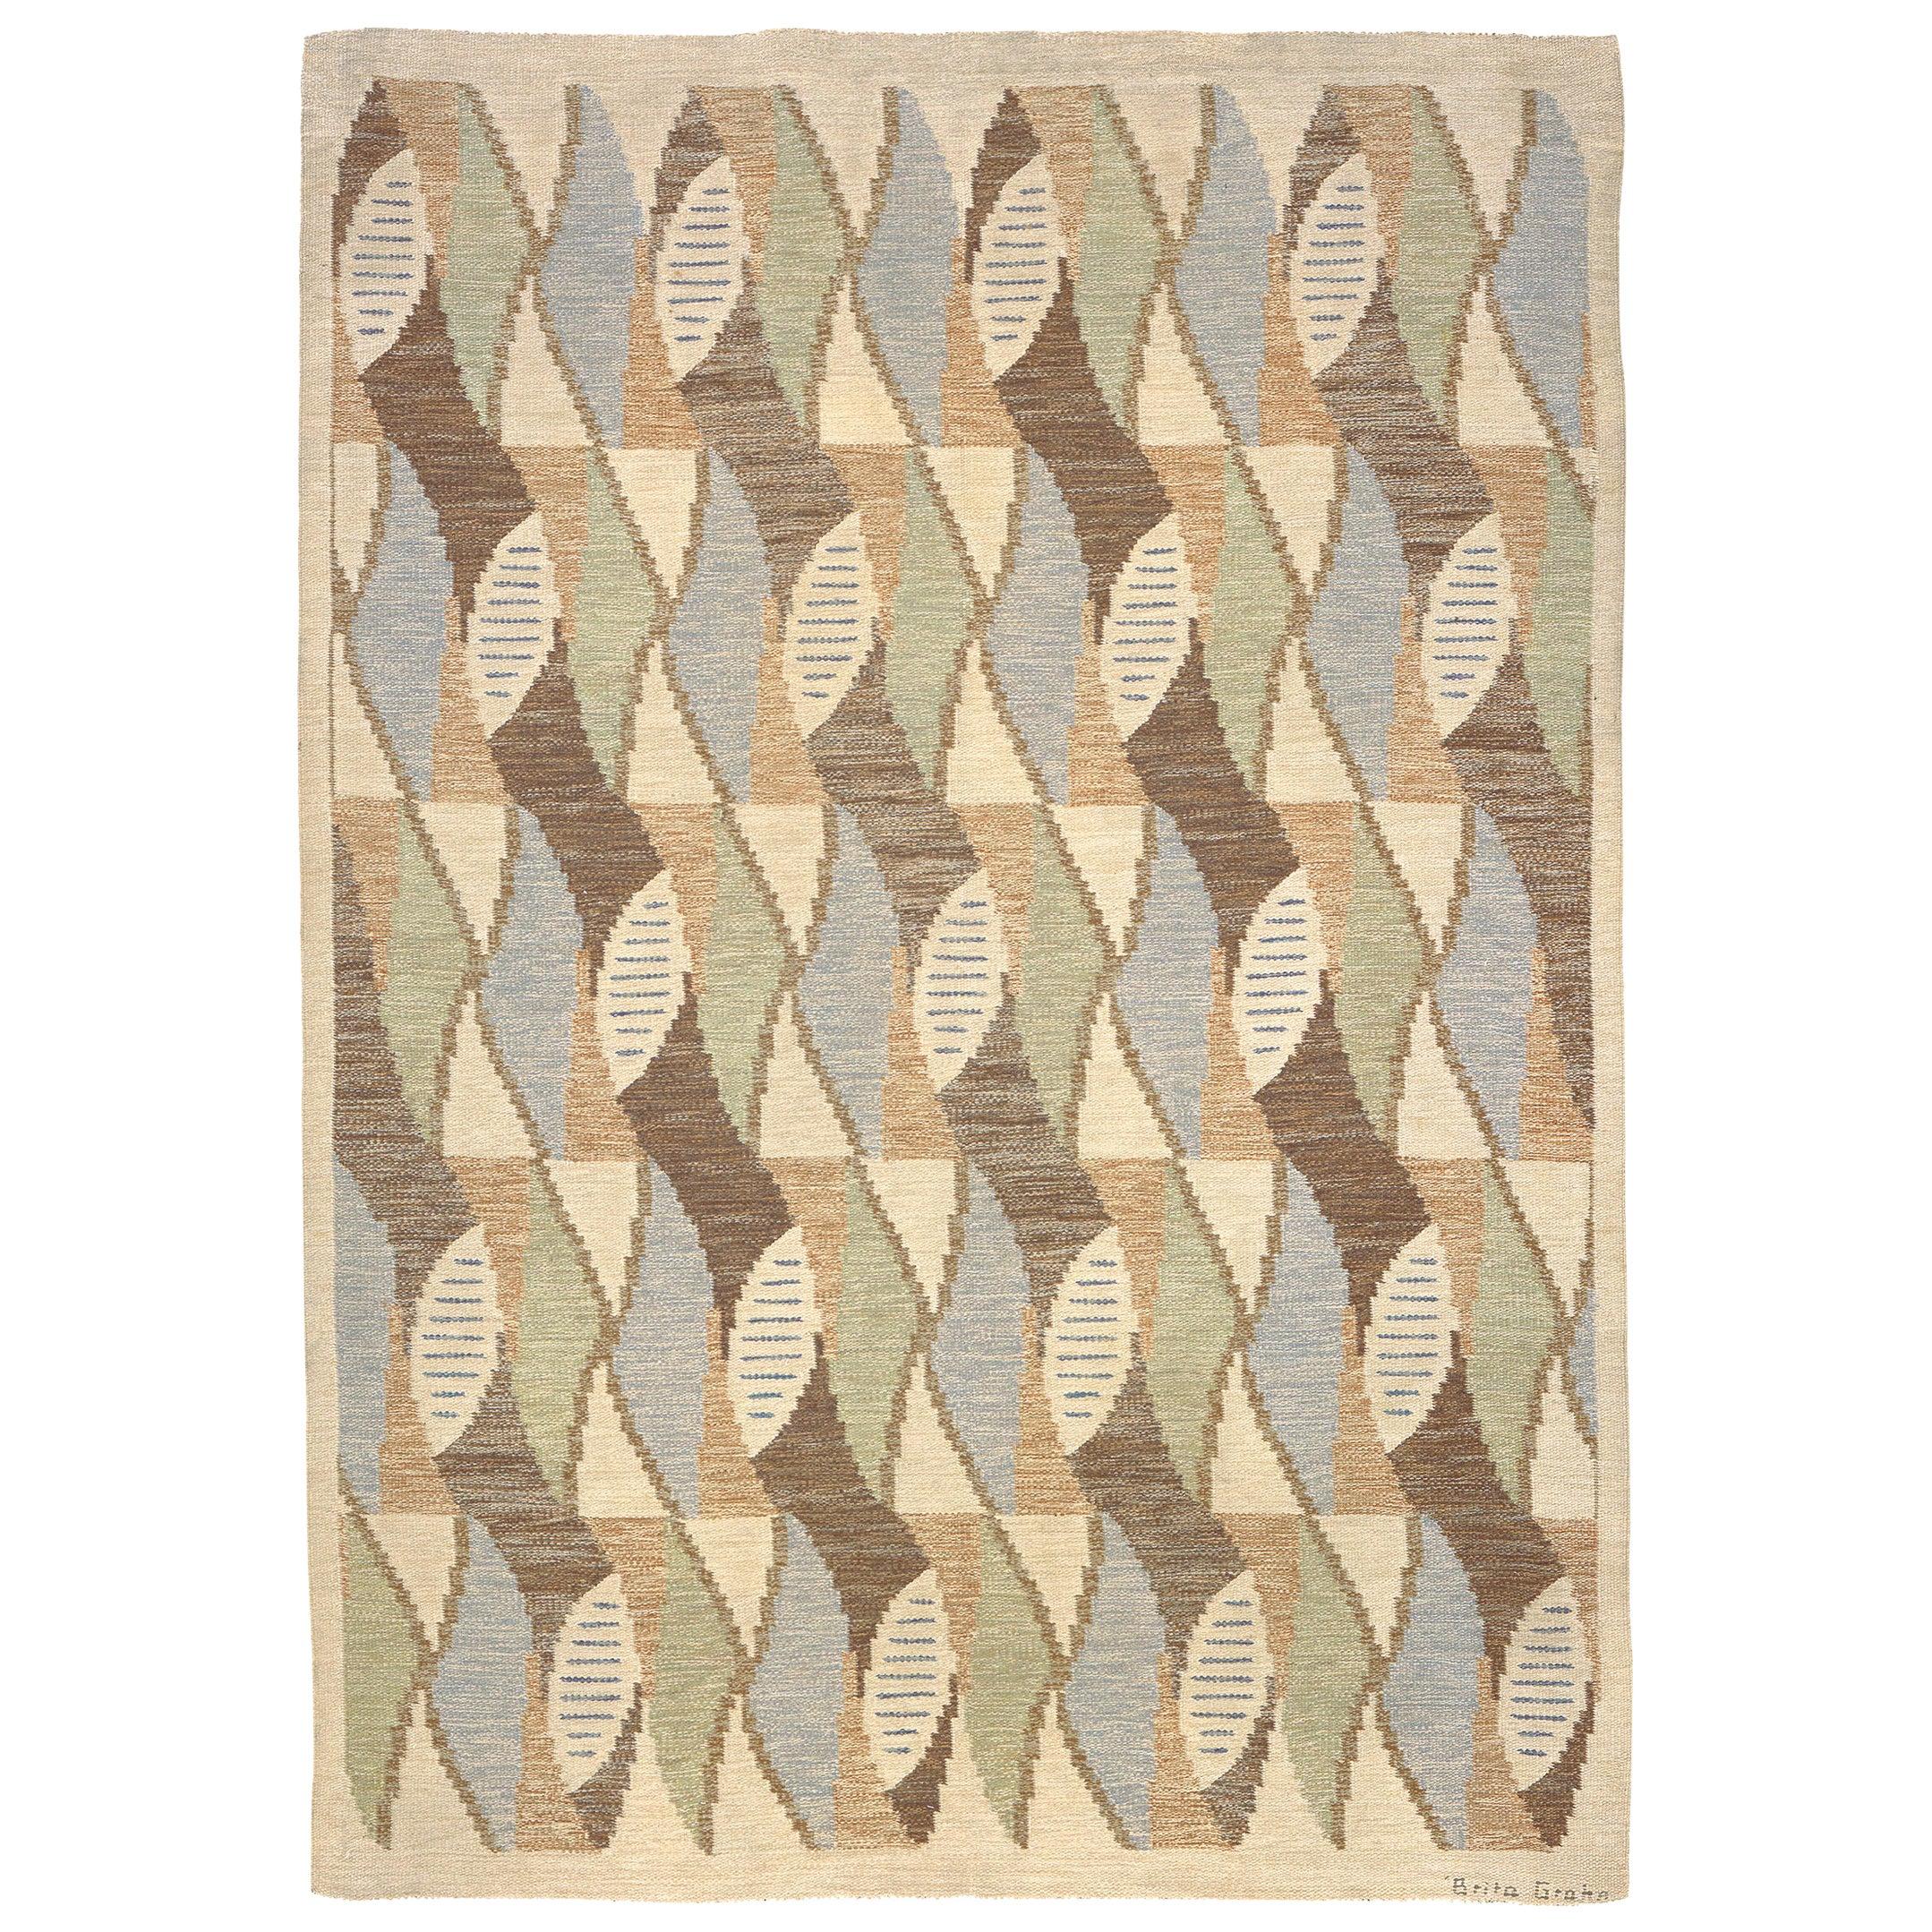 Mid-20th Century Swedish Flat-Weave Rug by Brita Grahn